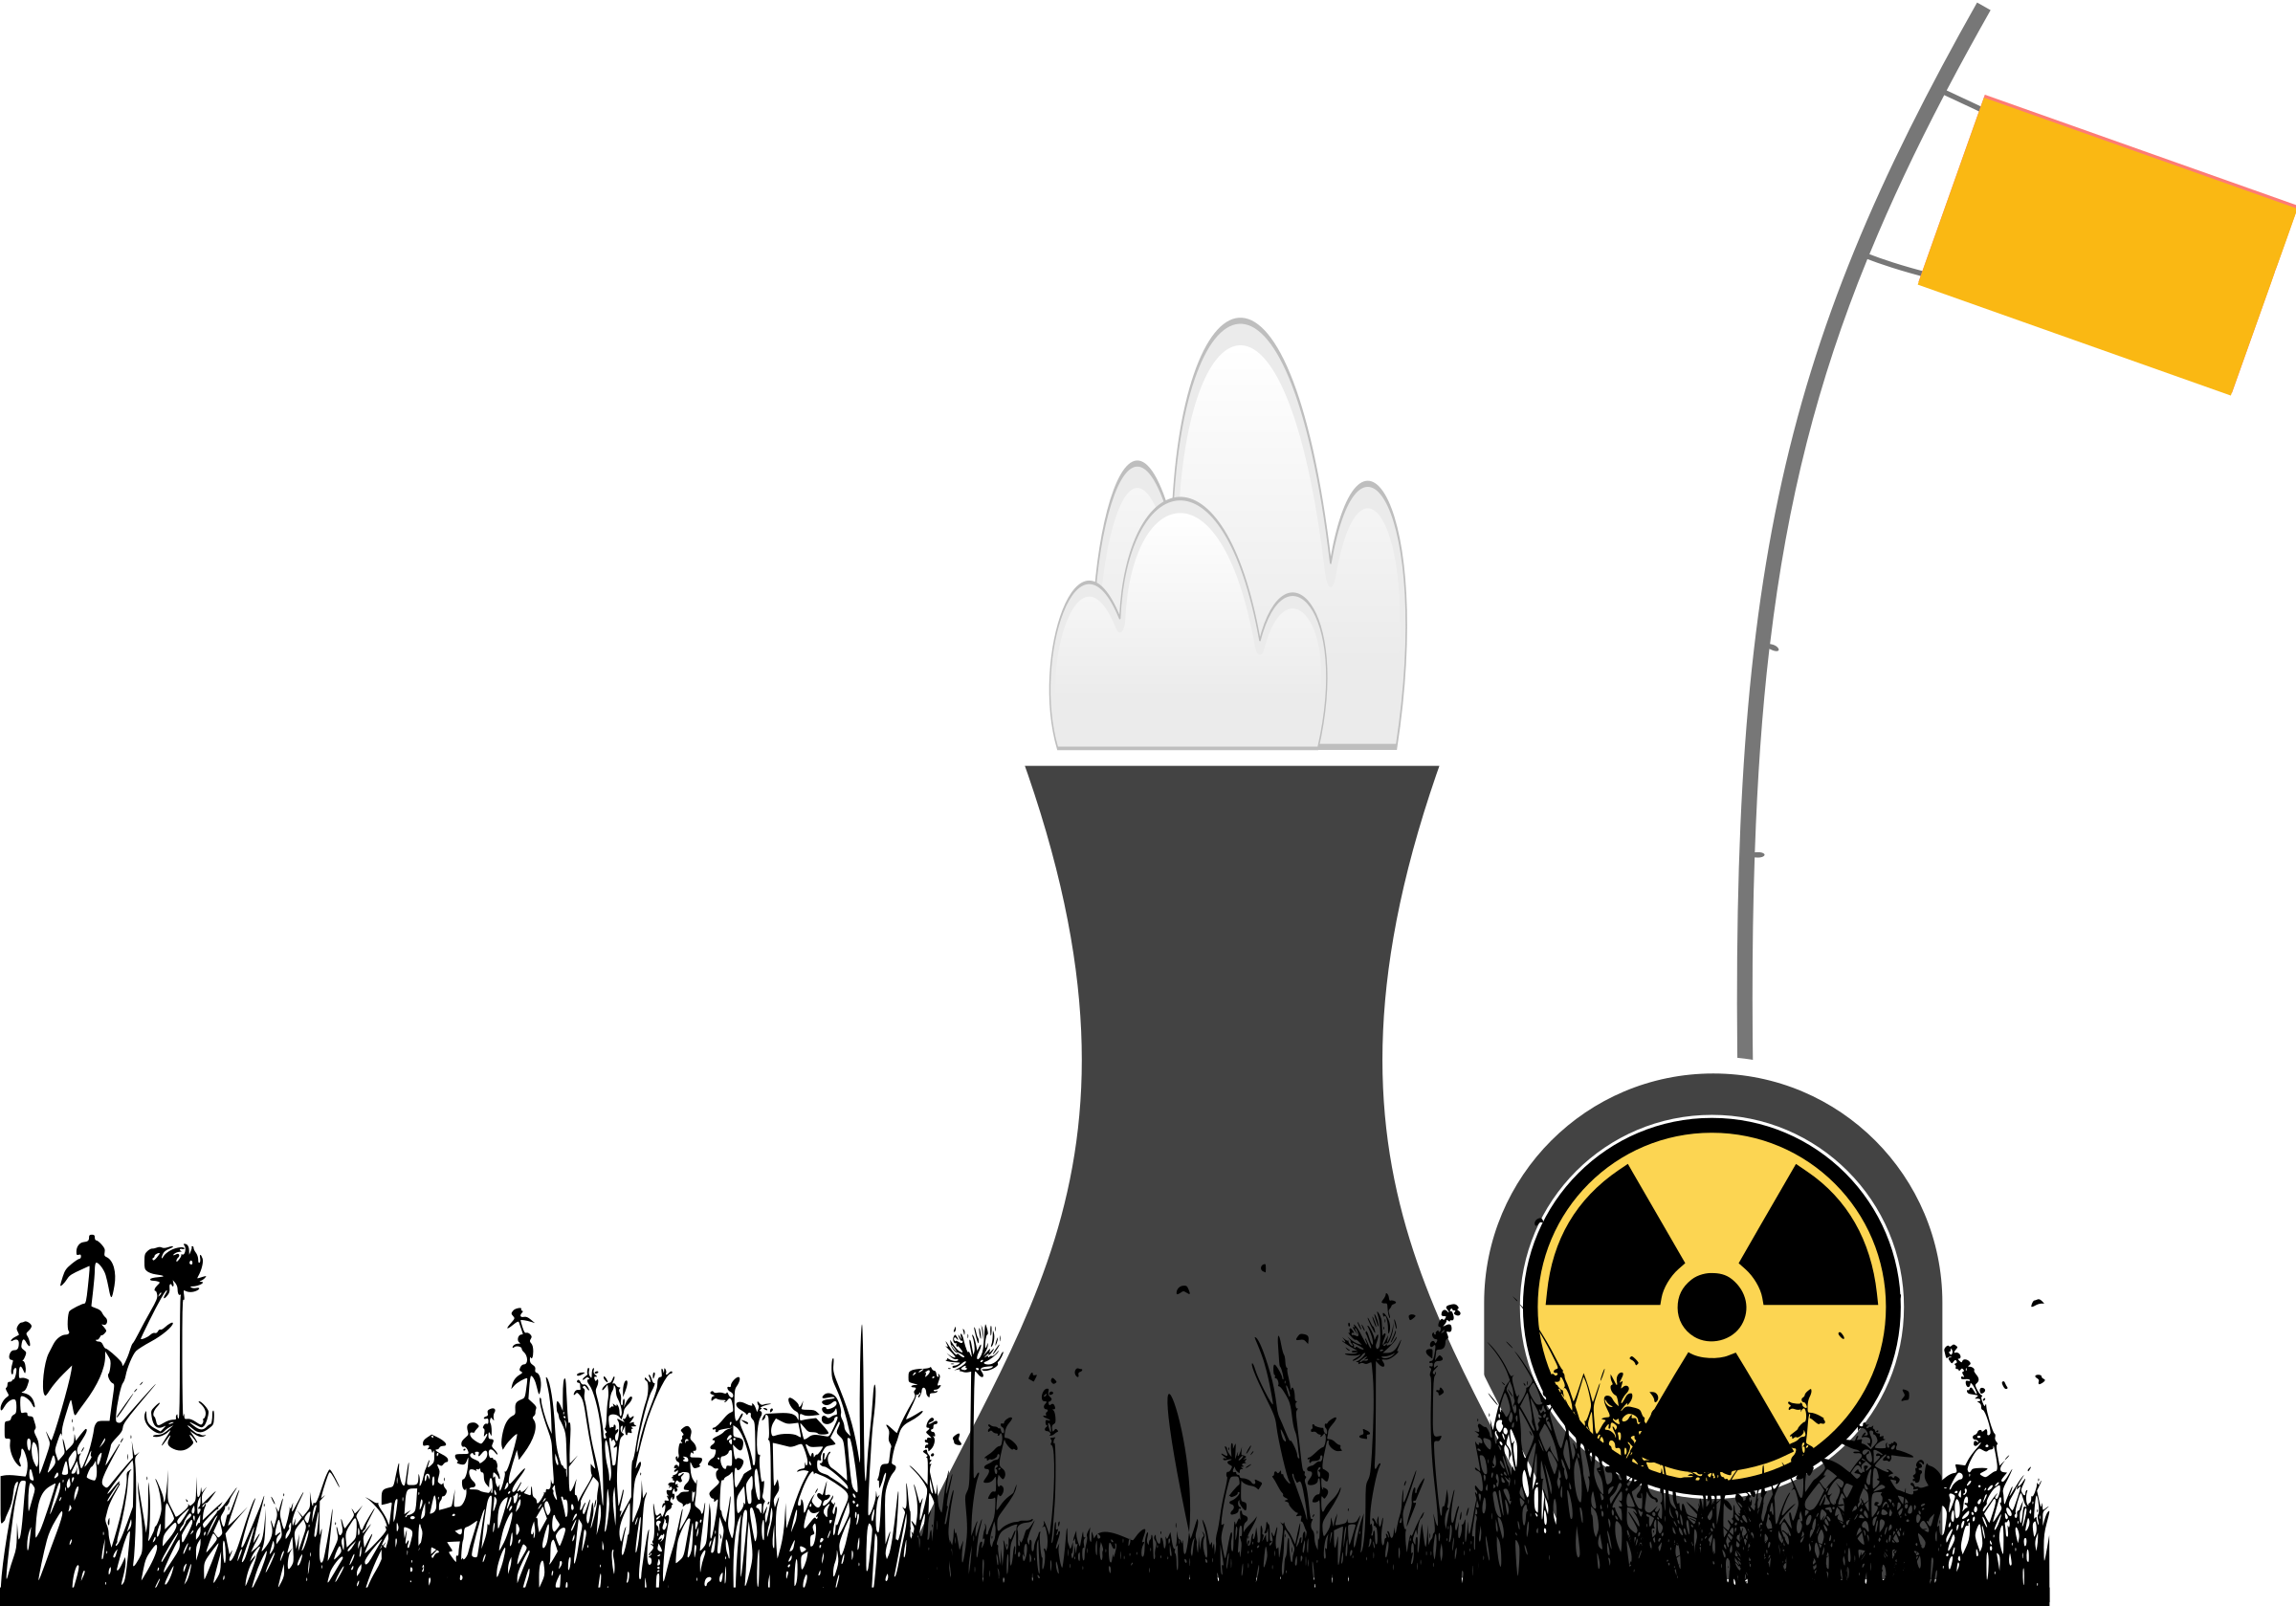 Explosions nuclear power plant. Explosion clipart nuke explosion